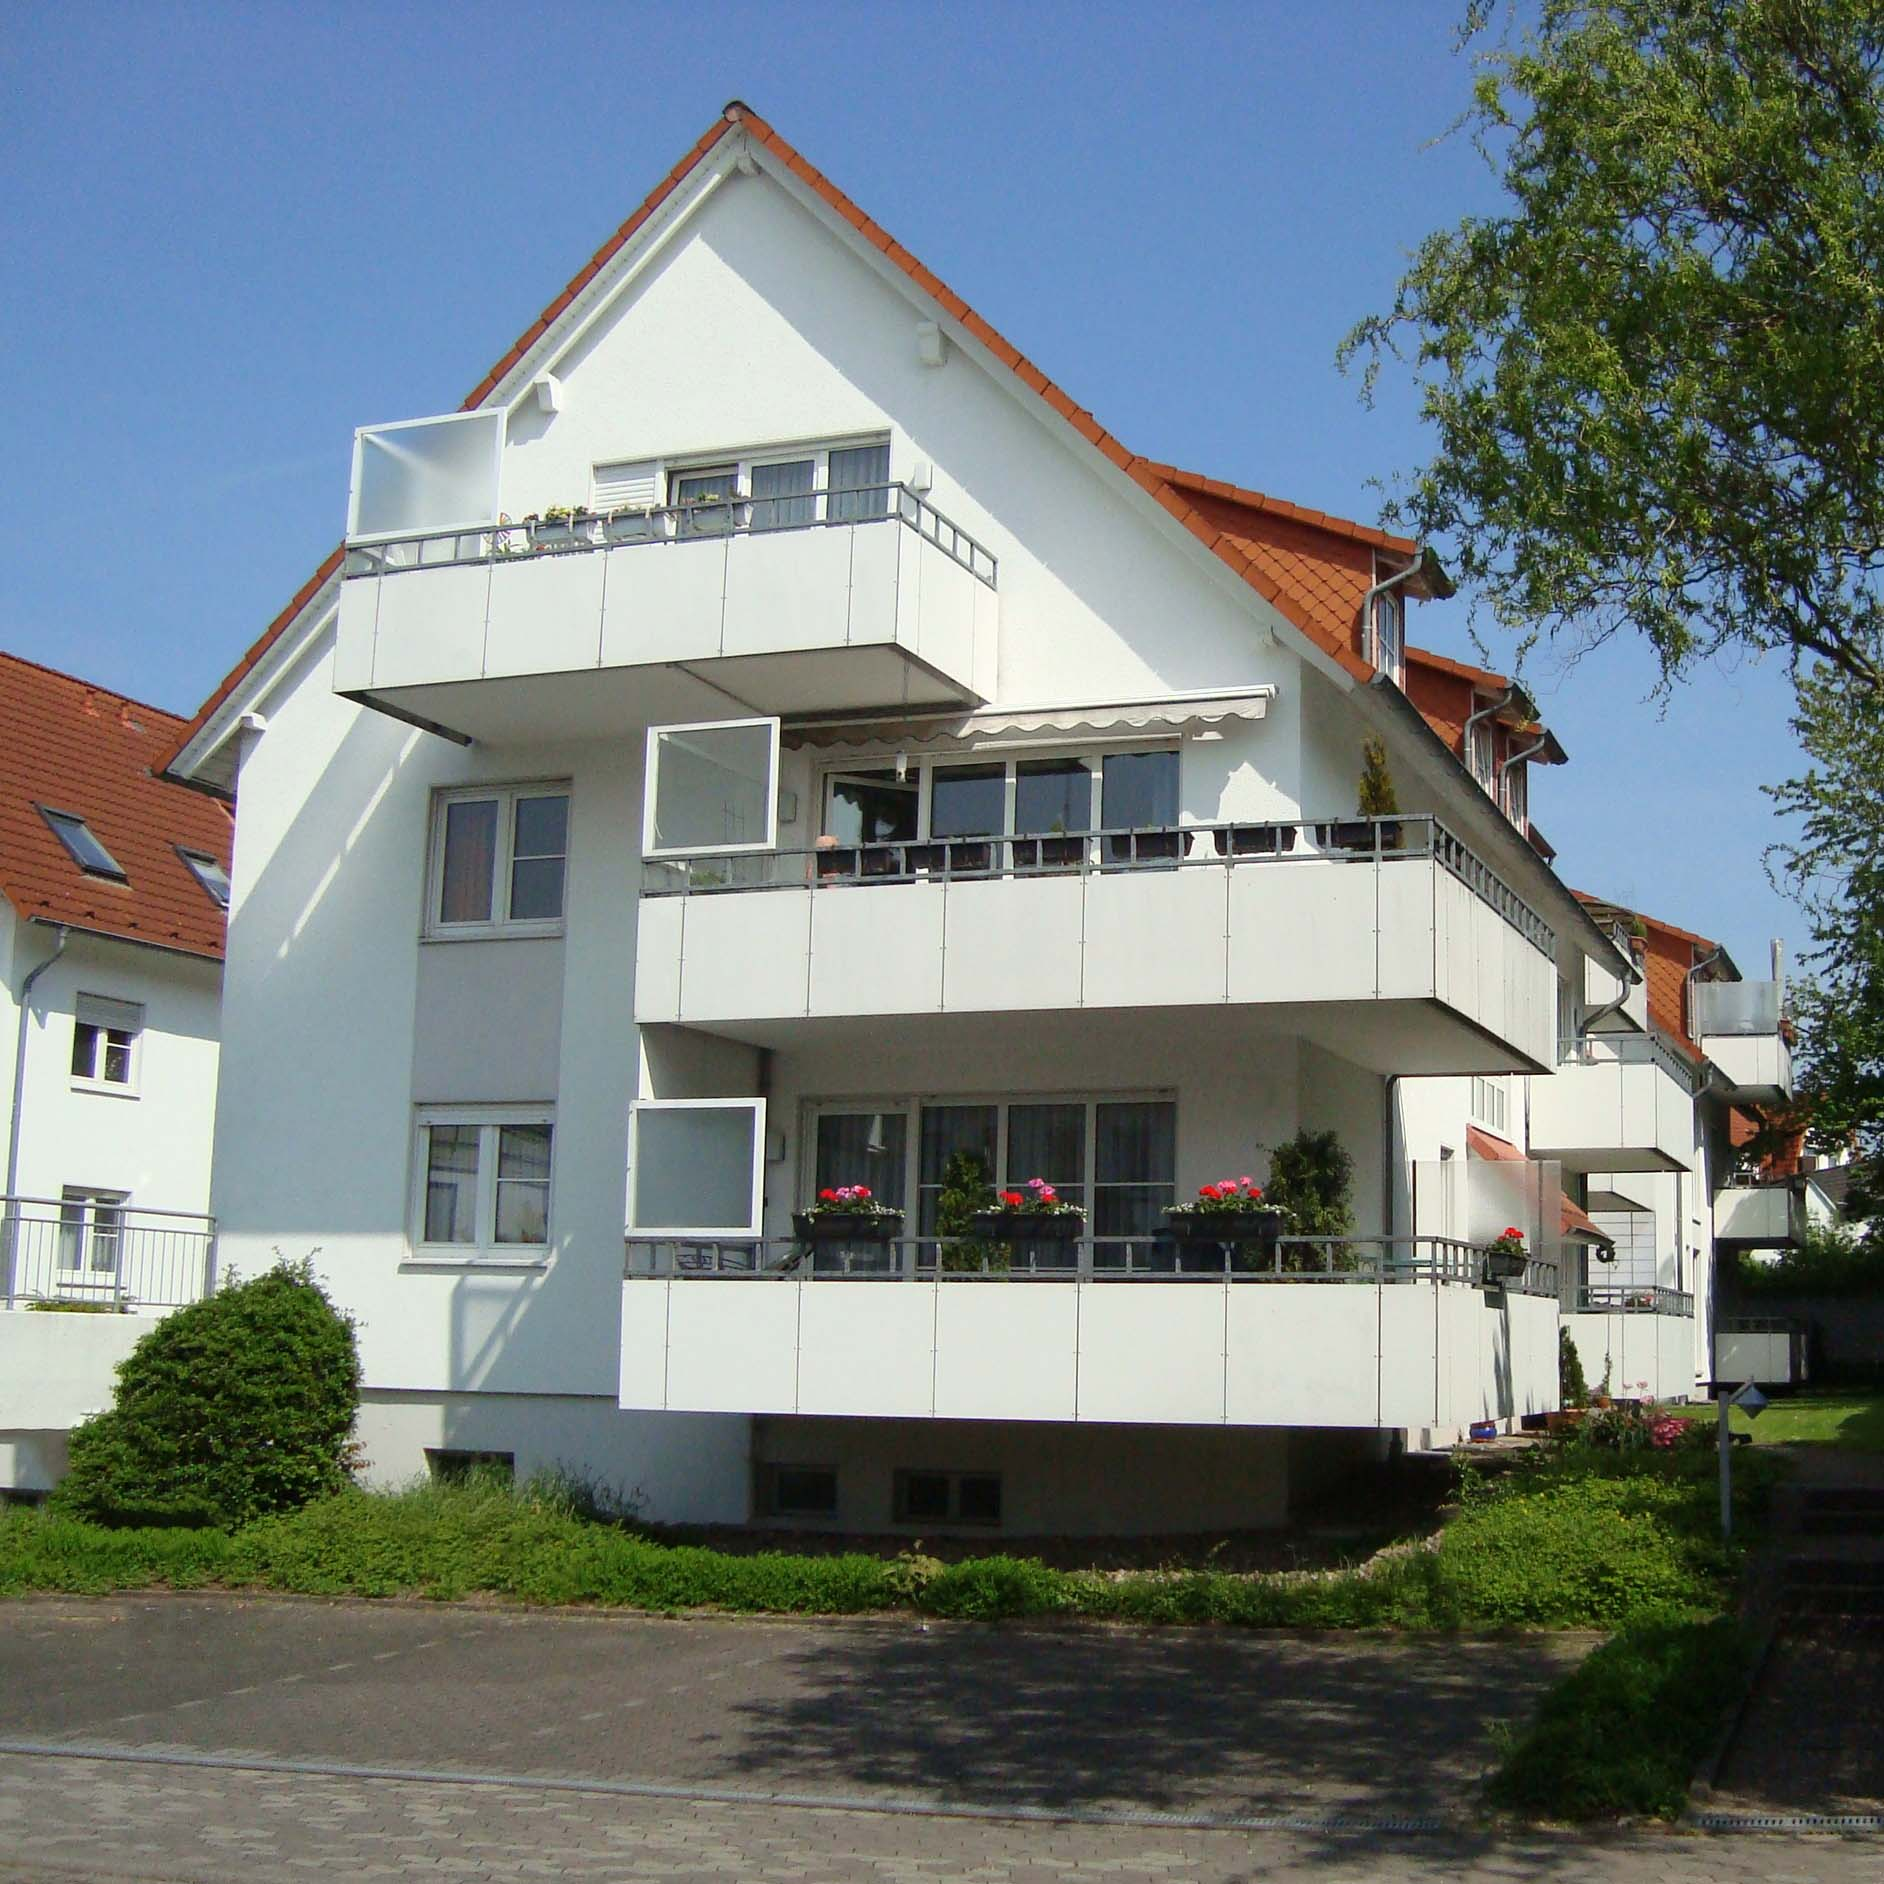 afg imac - Immobilienmakler Mehrfamilienhäuser